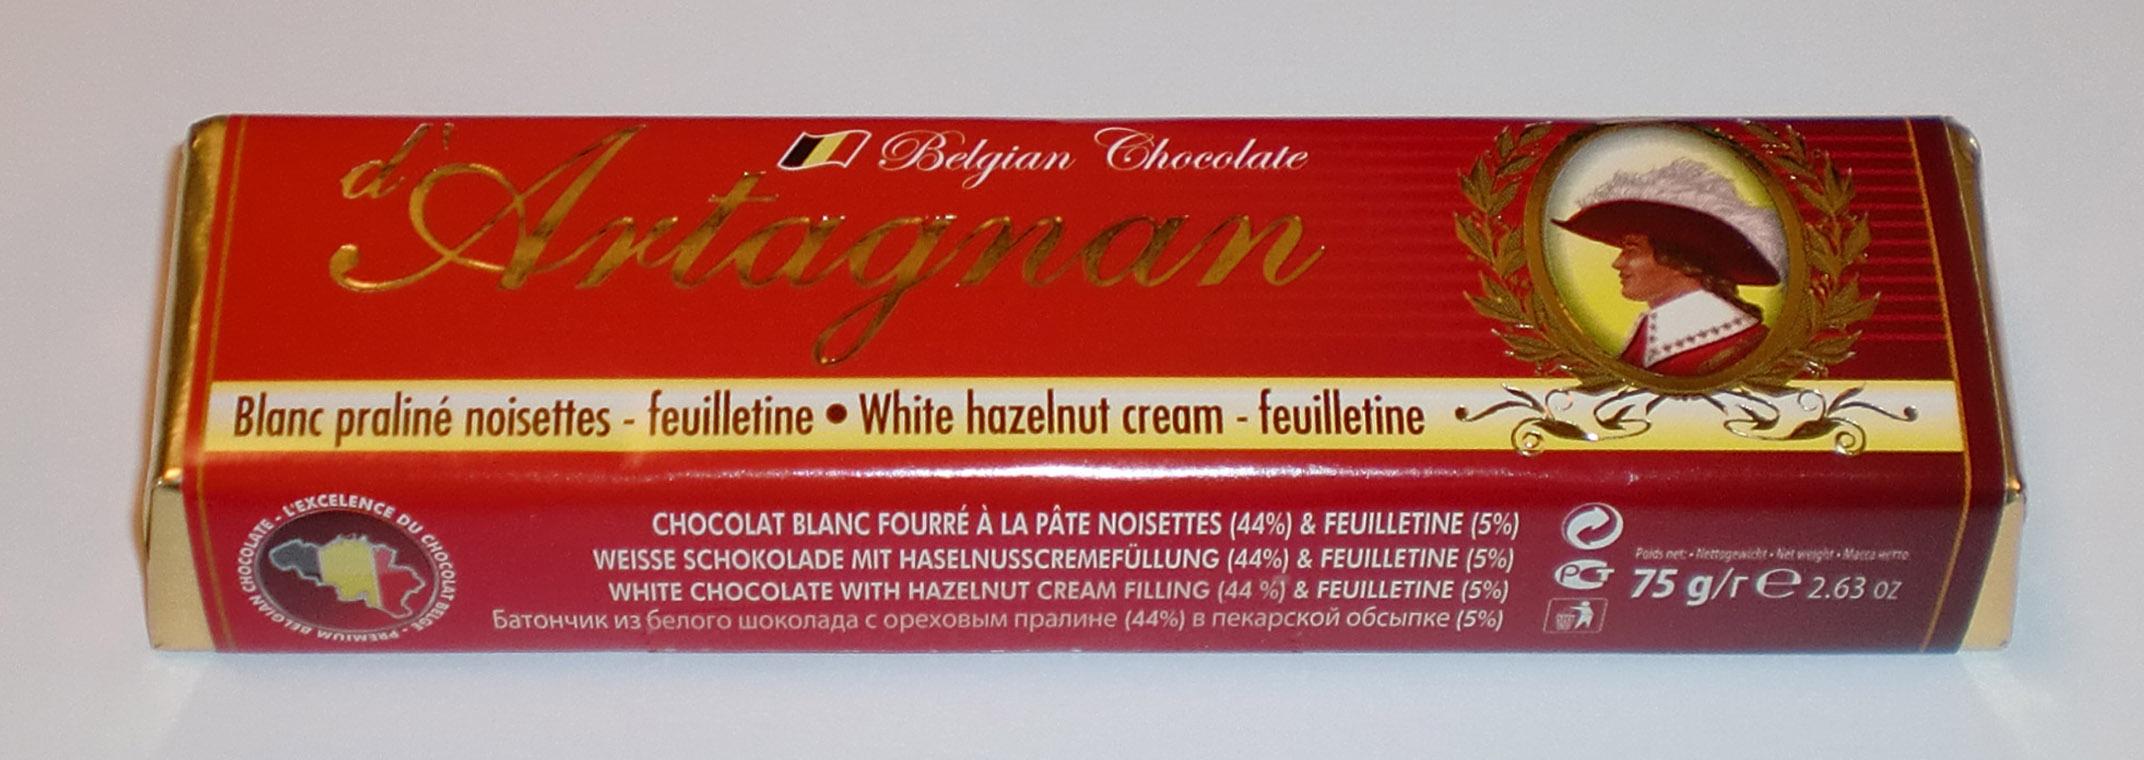 D1272 - Chocolat blanc feuilletine.jpg